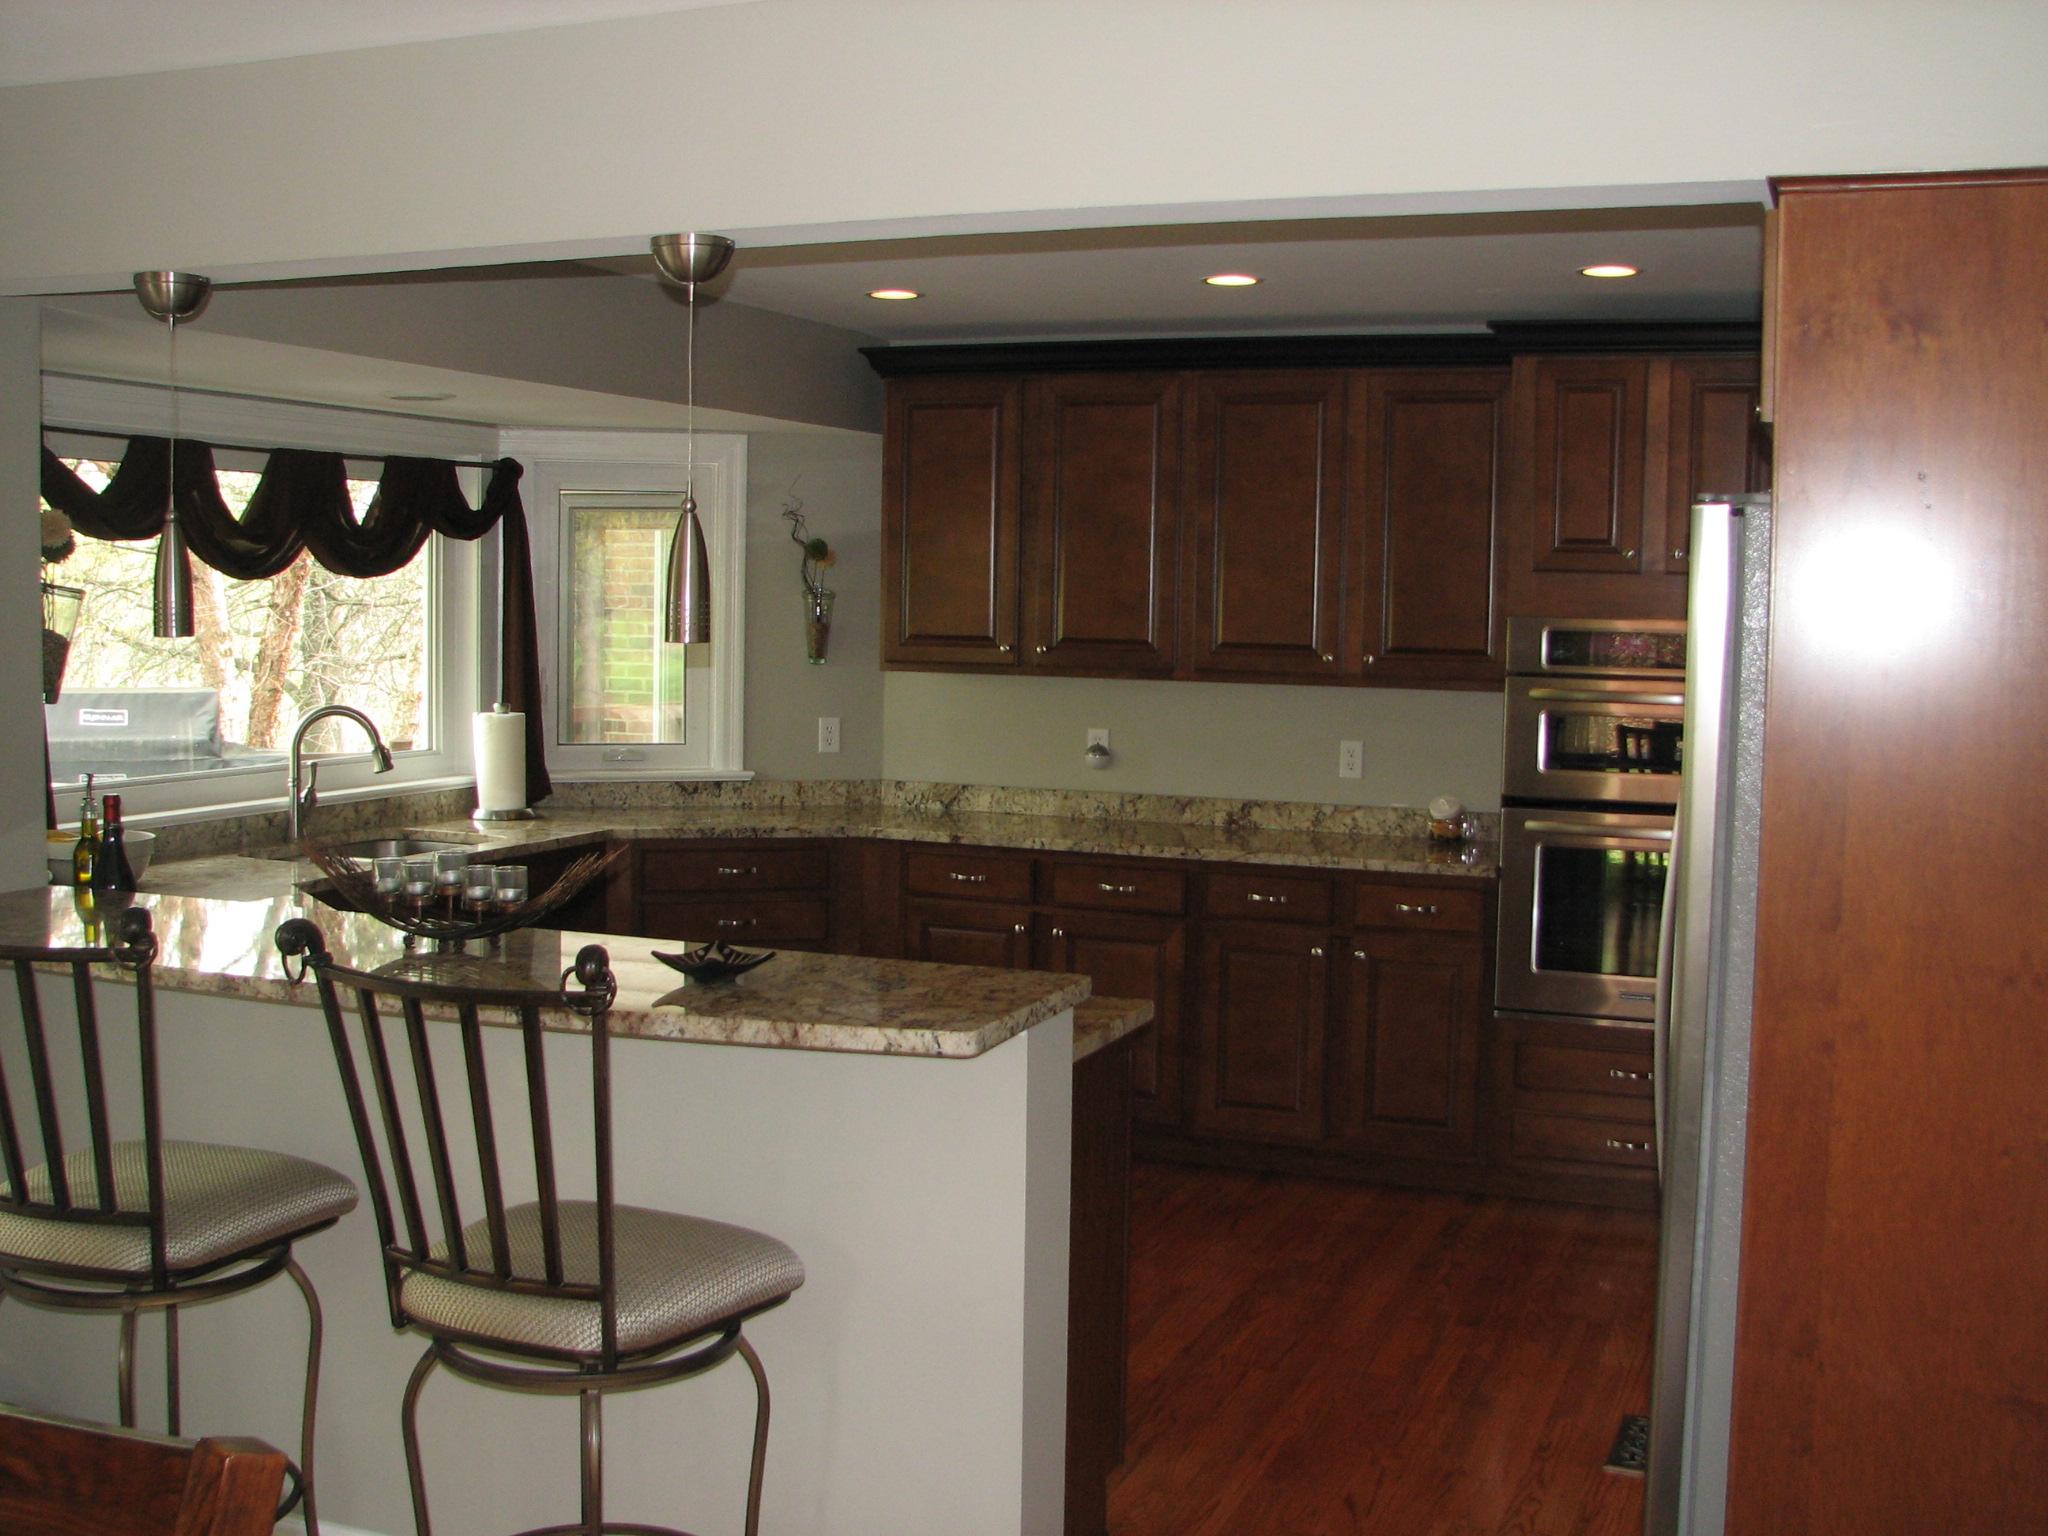 Kitchen Renovation Ideas - Terbrock Construction on Small:xmqi70Klvwi= Kitchen Renovation Ideas  id=61418